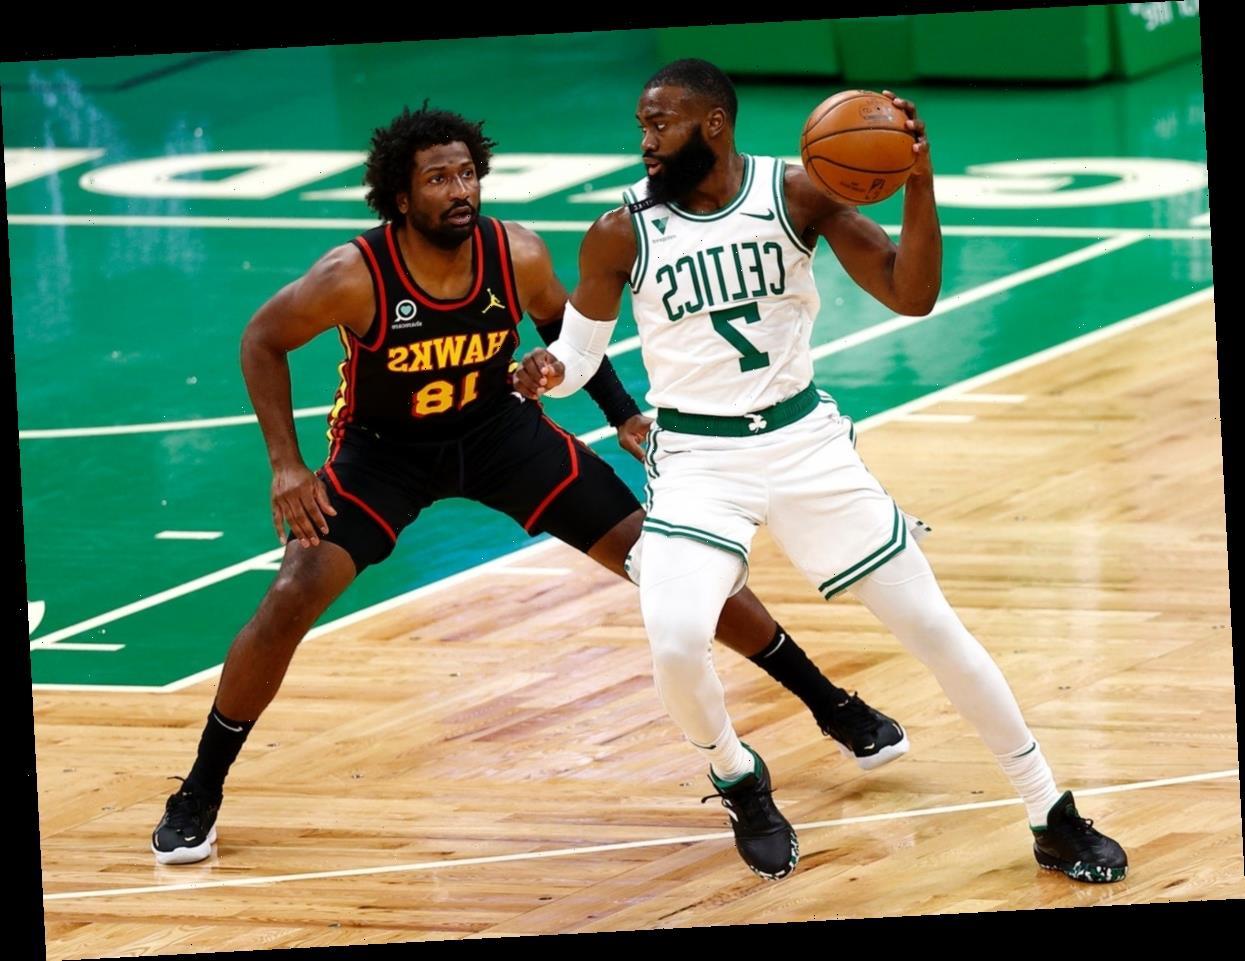 Jaylen Brown: Boston Celtics star nets first-time All-Star selection after standout season